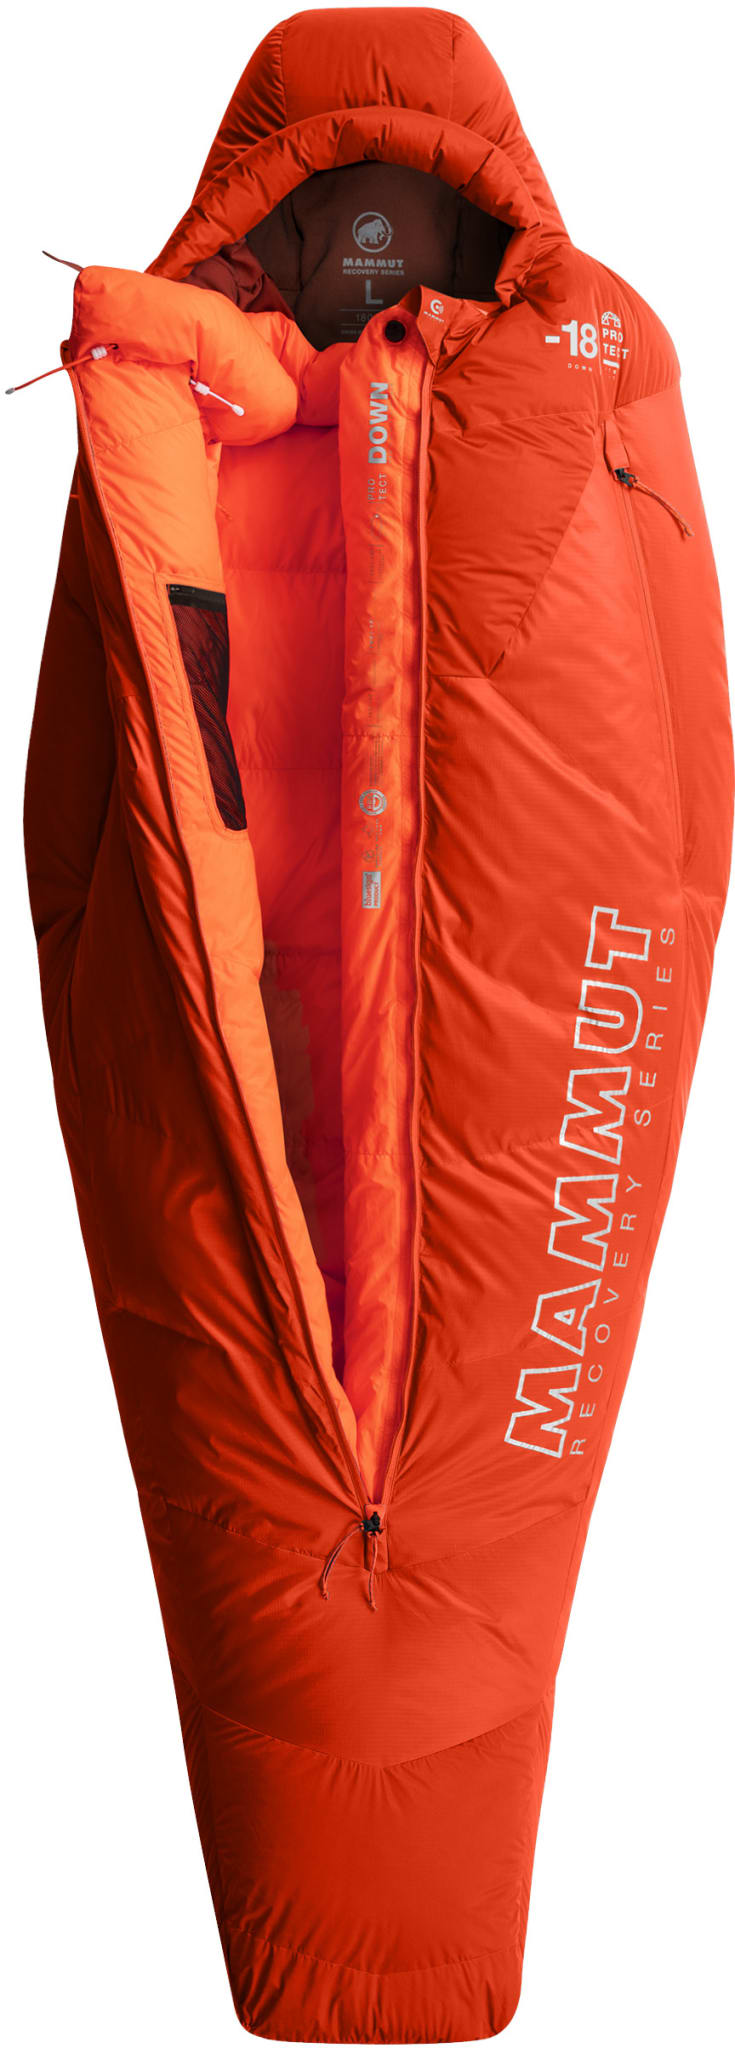 Innovativ vintersovepose med dunisolasjon